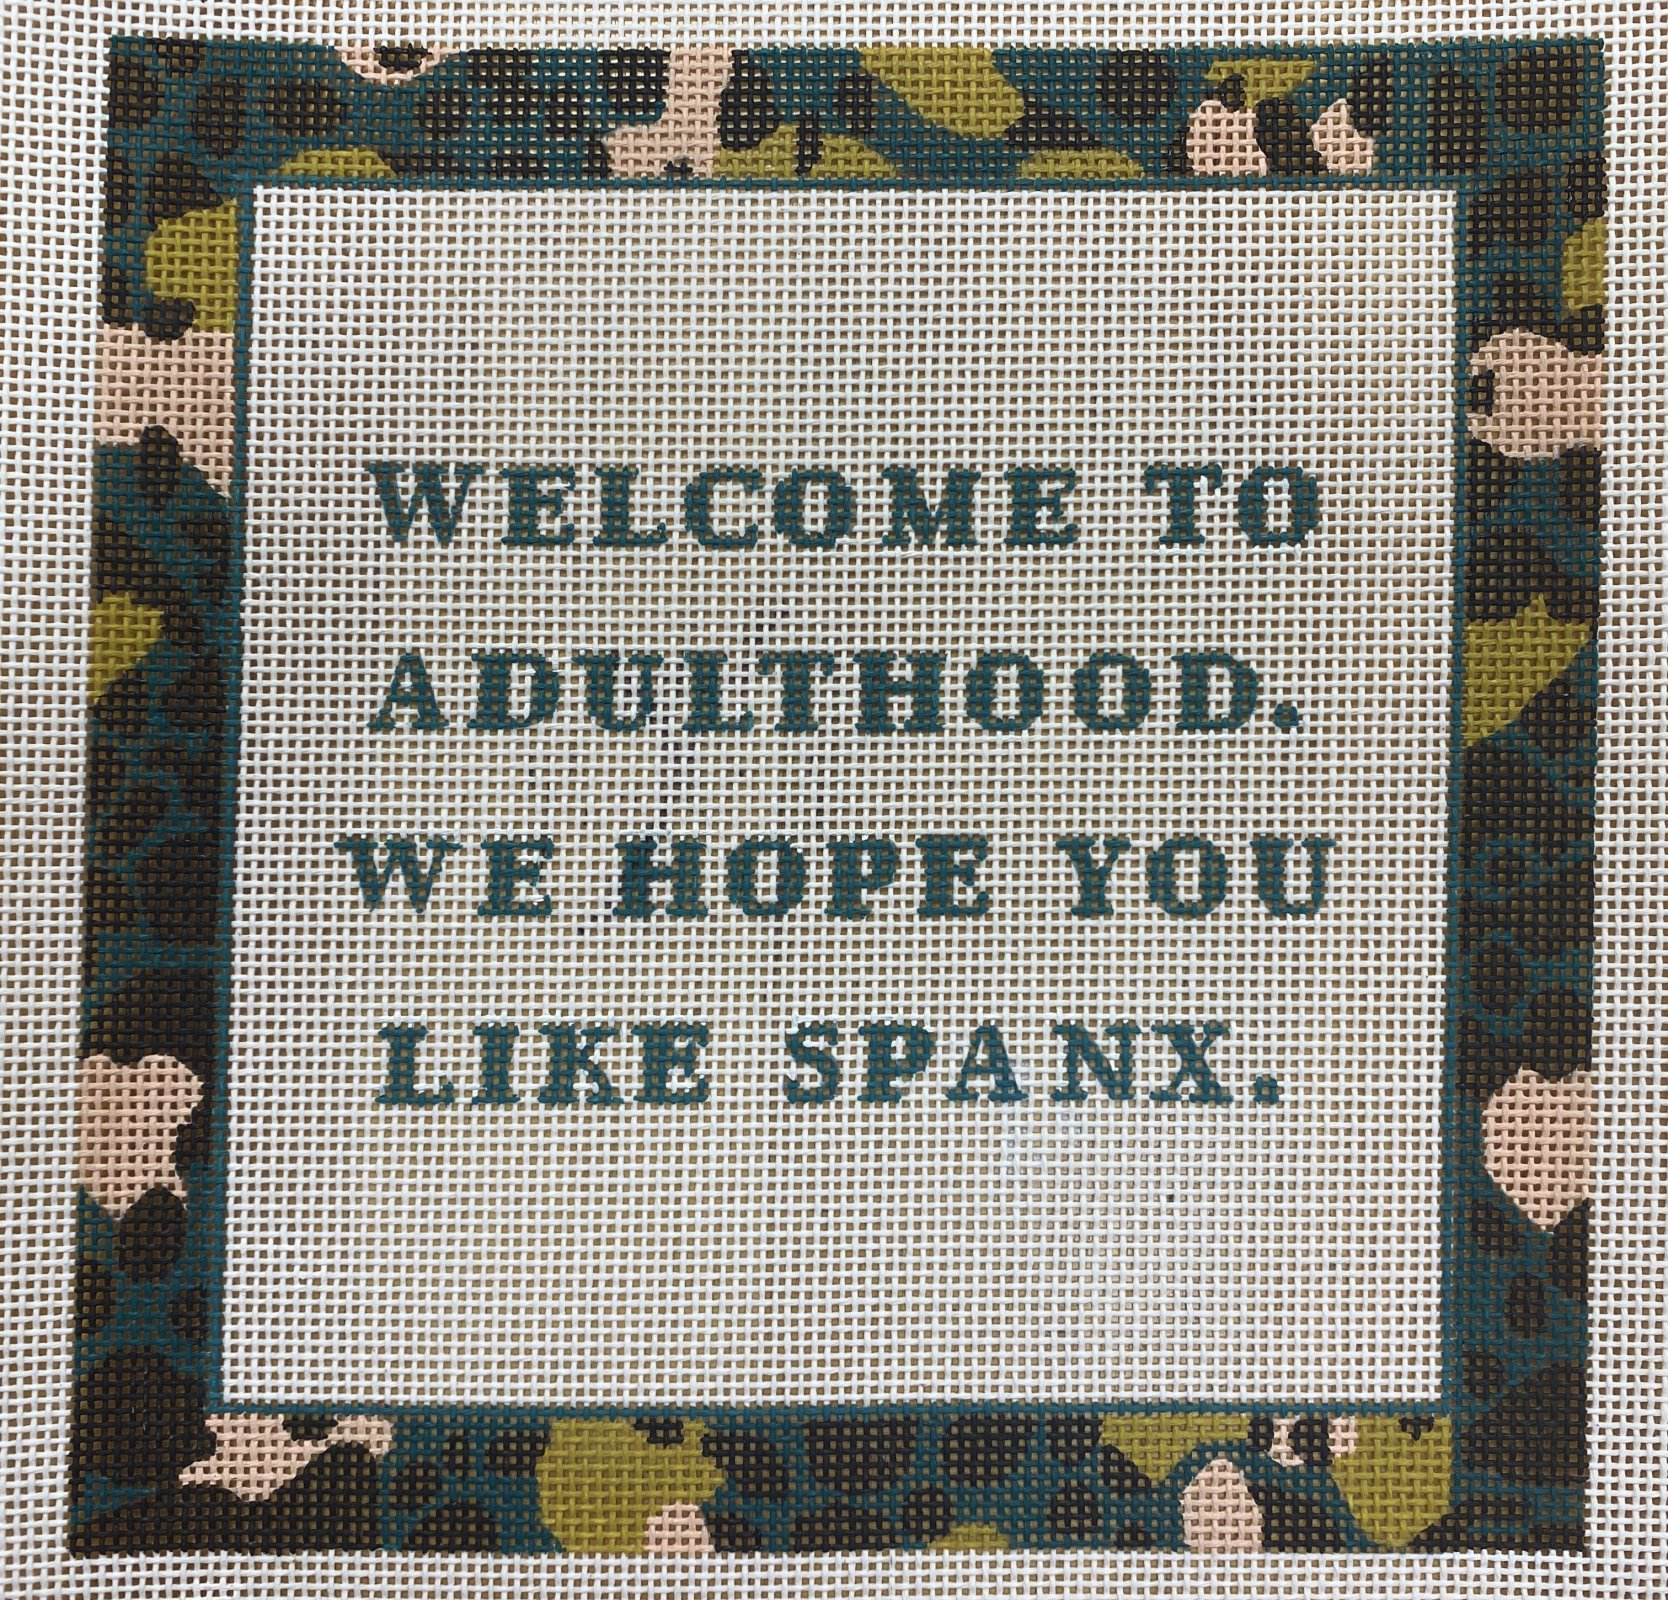 welcome to adulthood, spanx